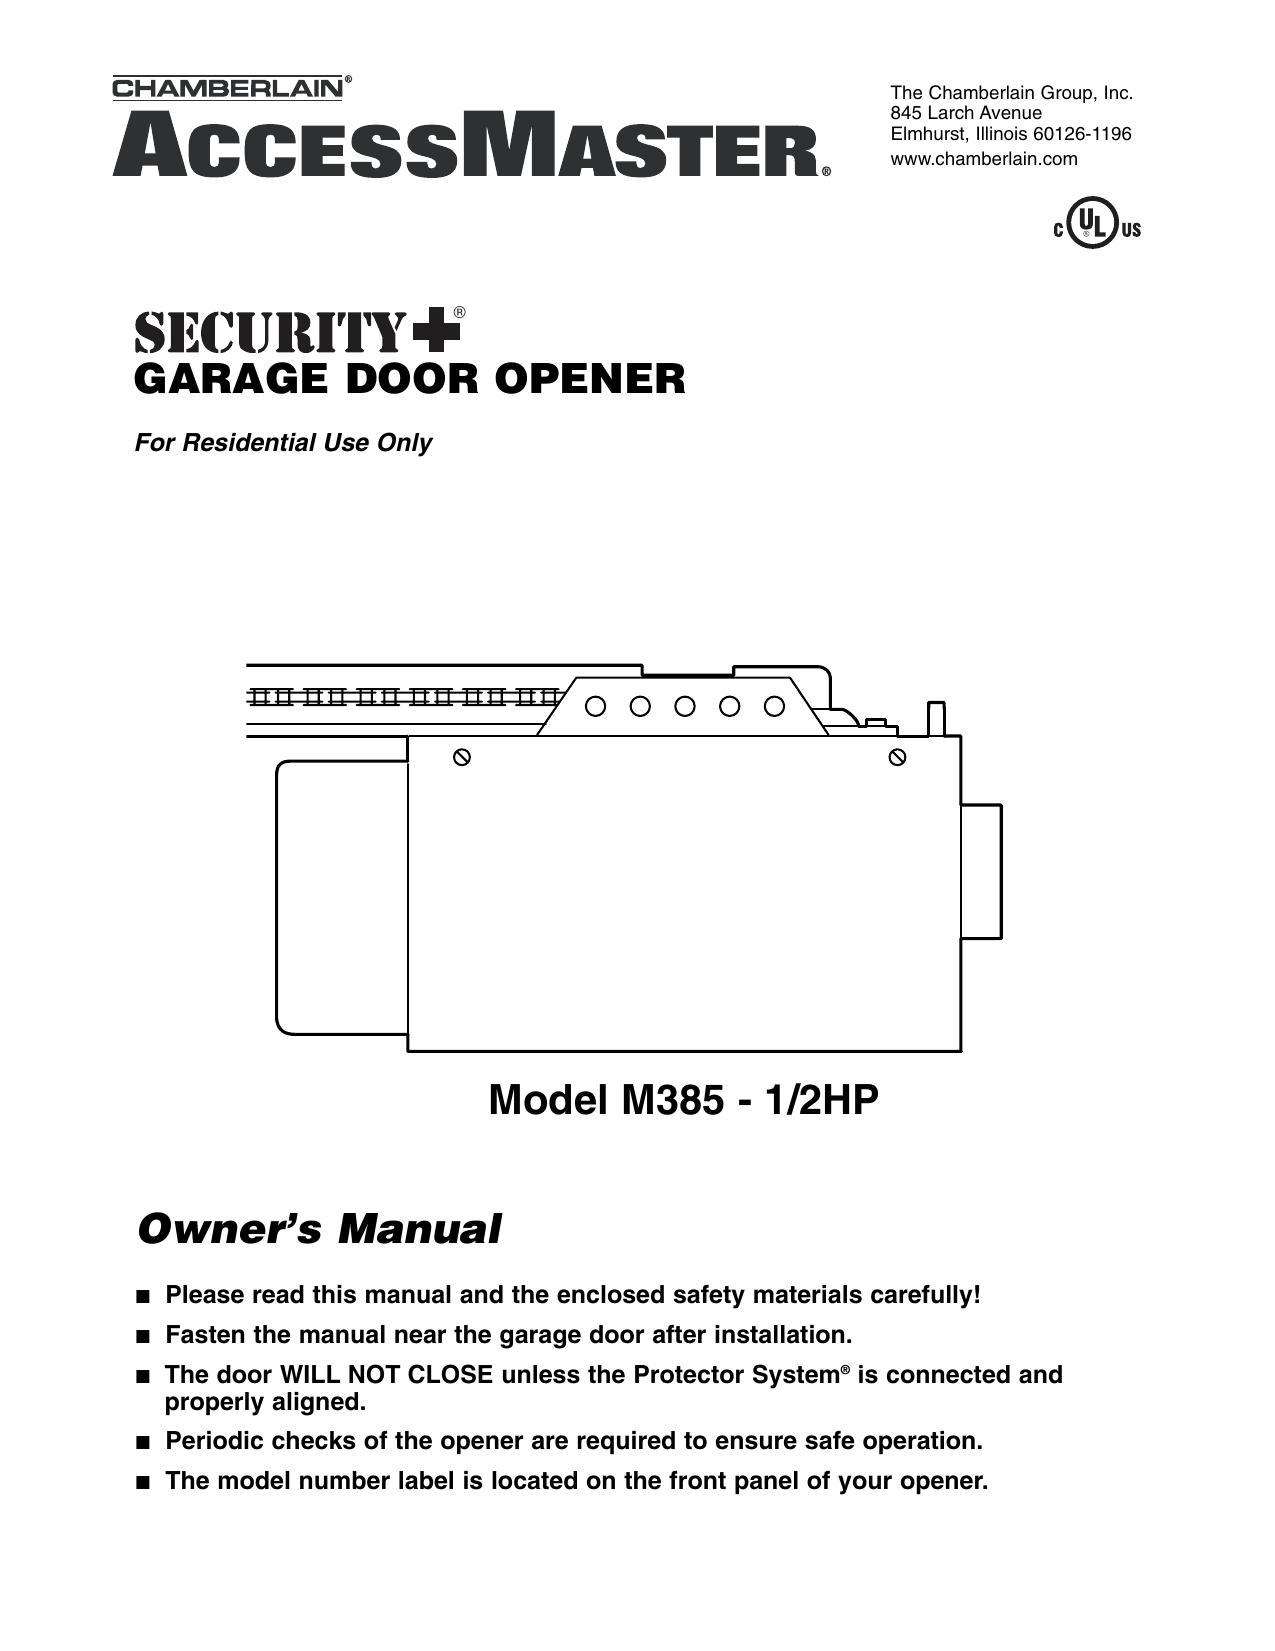 hight resolution of chamberlain m385 user s manual